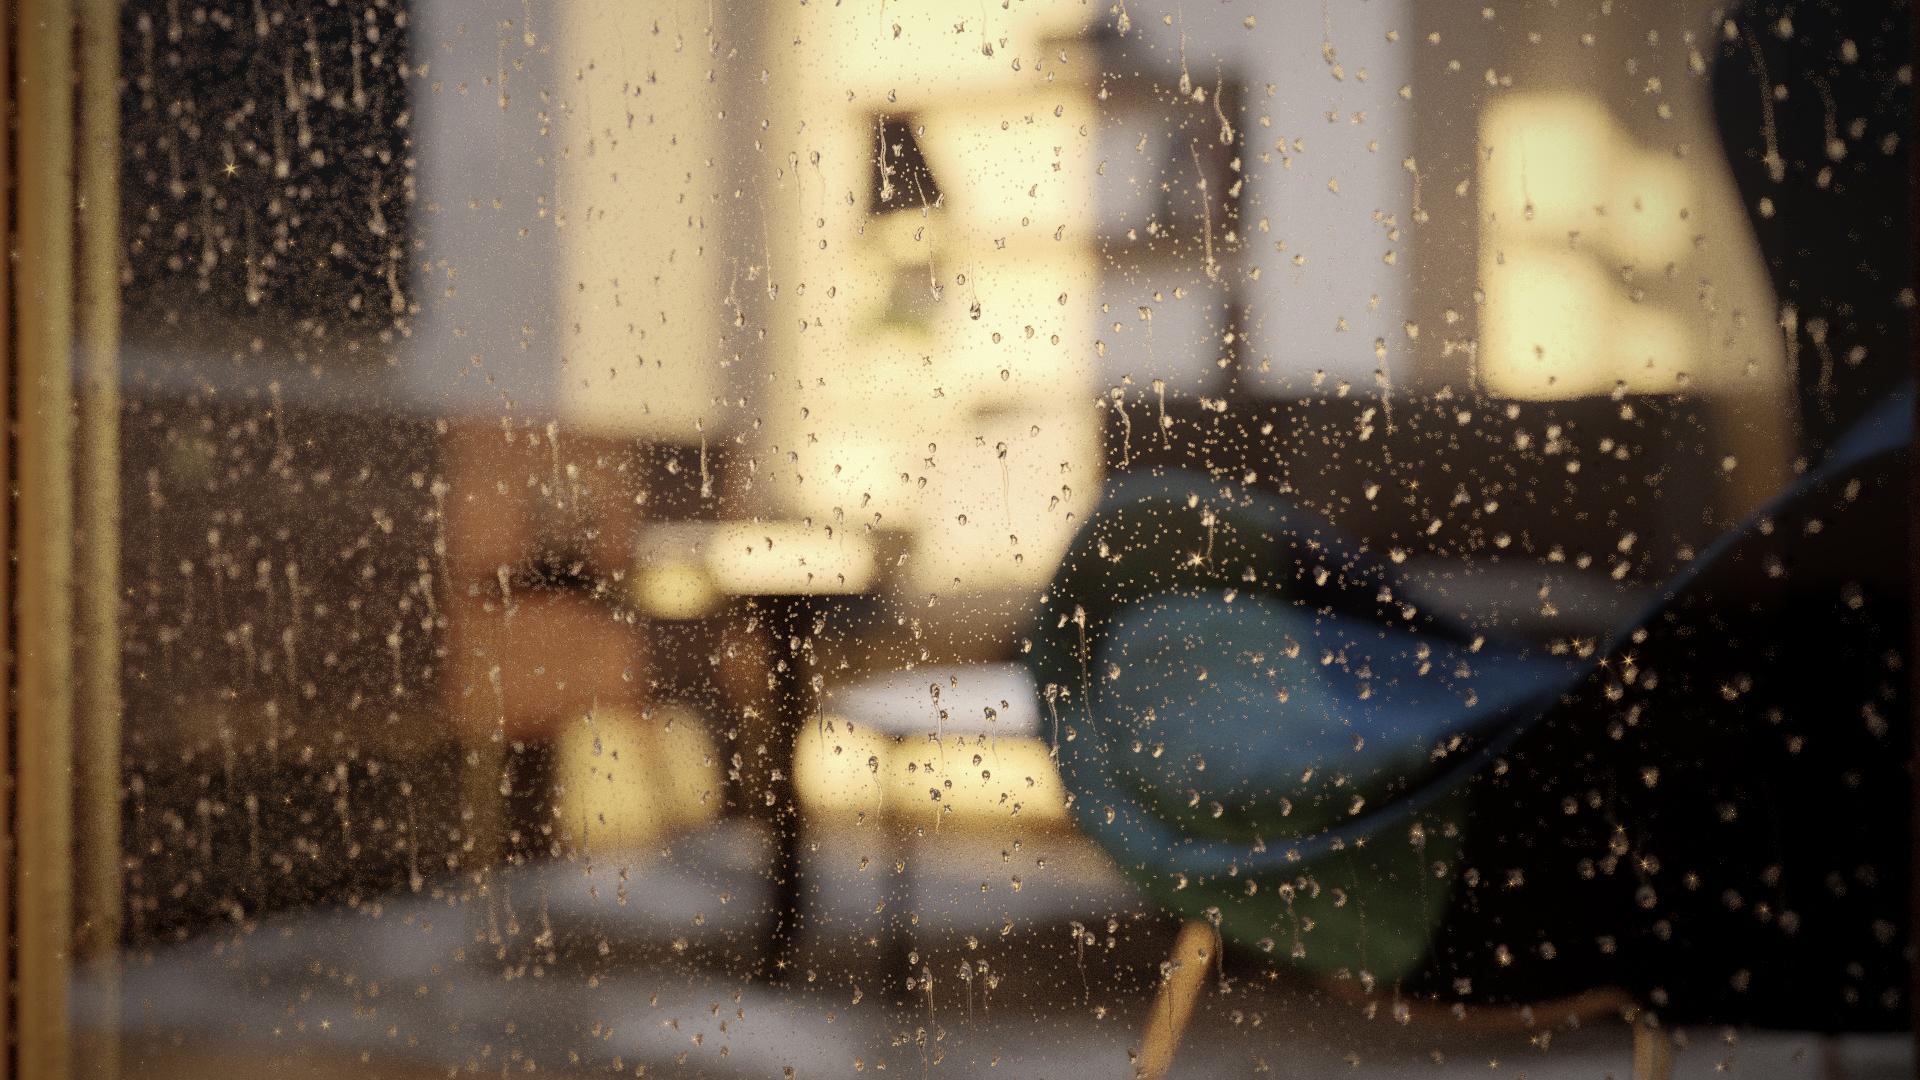 Make it rain, by  Straka CGI